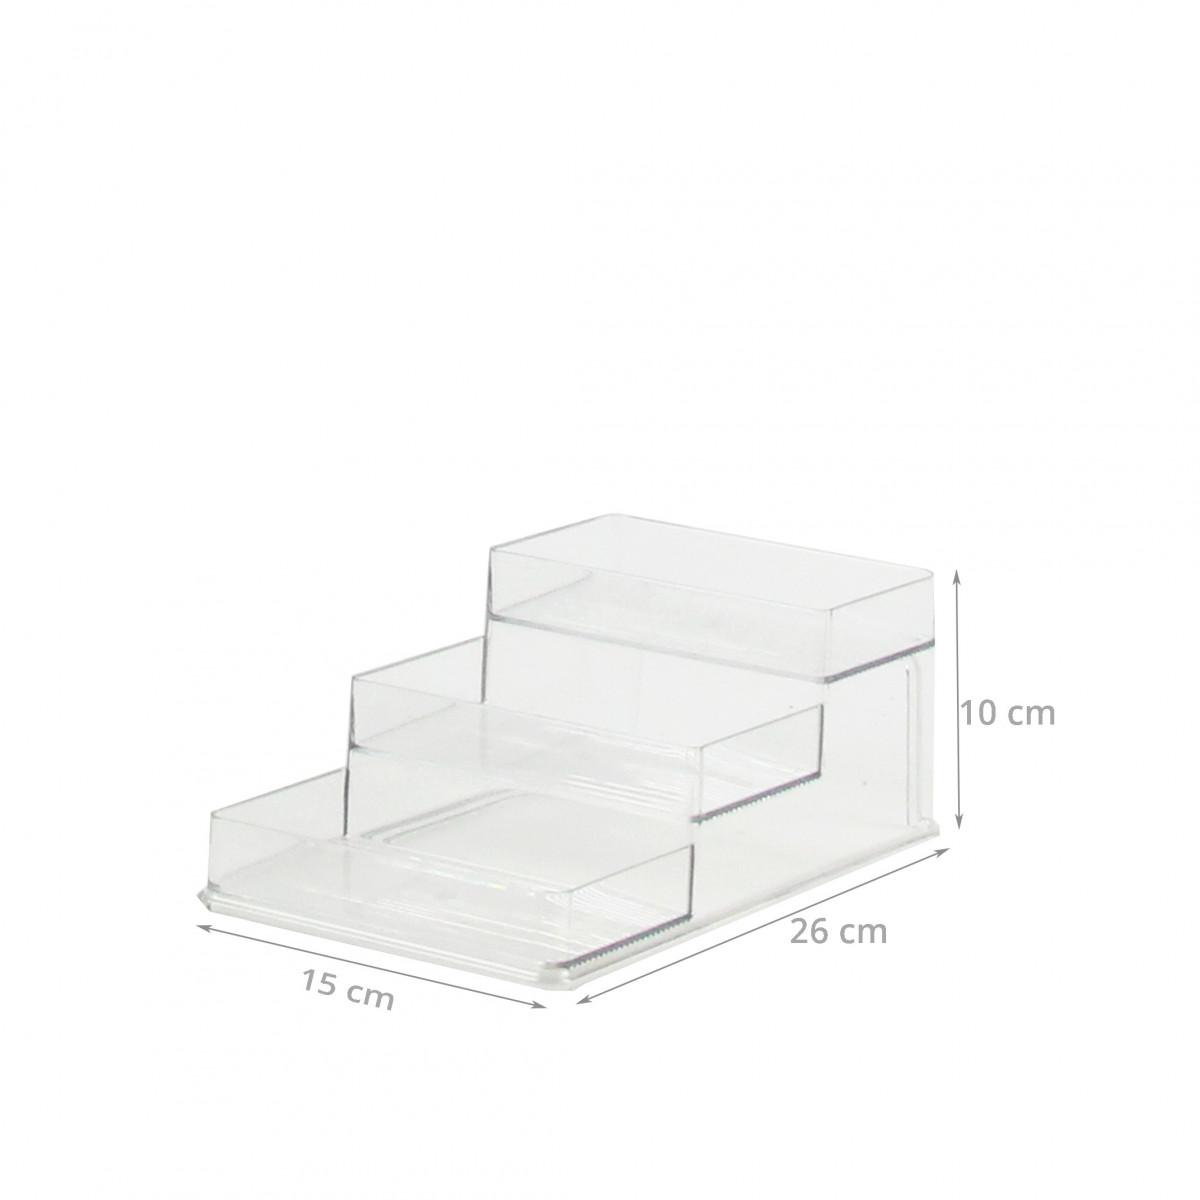 etag re a pices en plastique transparent 3 gradins. Black Bedroom Furniture Sets. Home Design Ideas